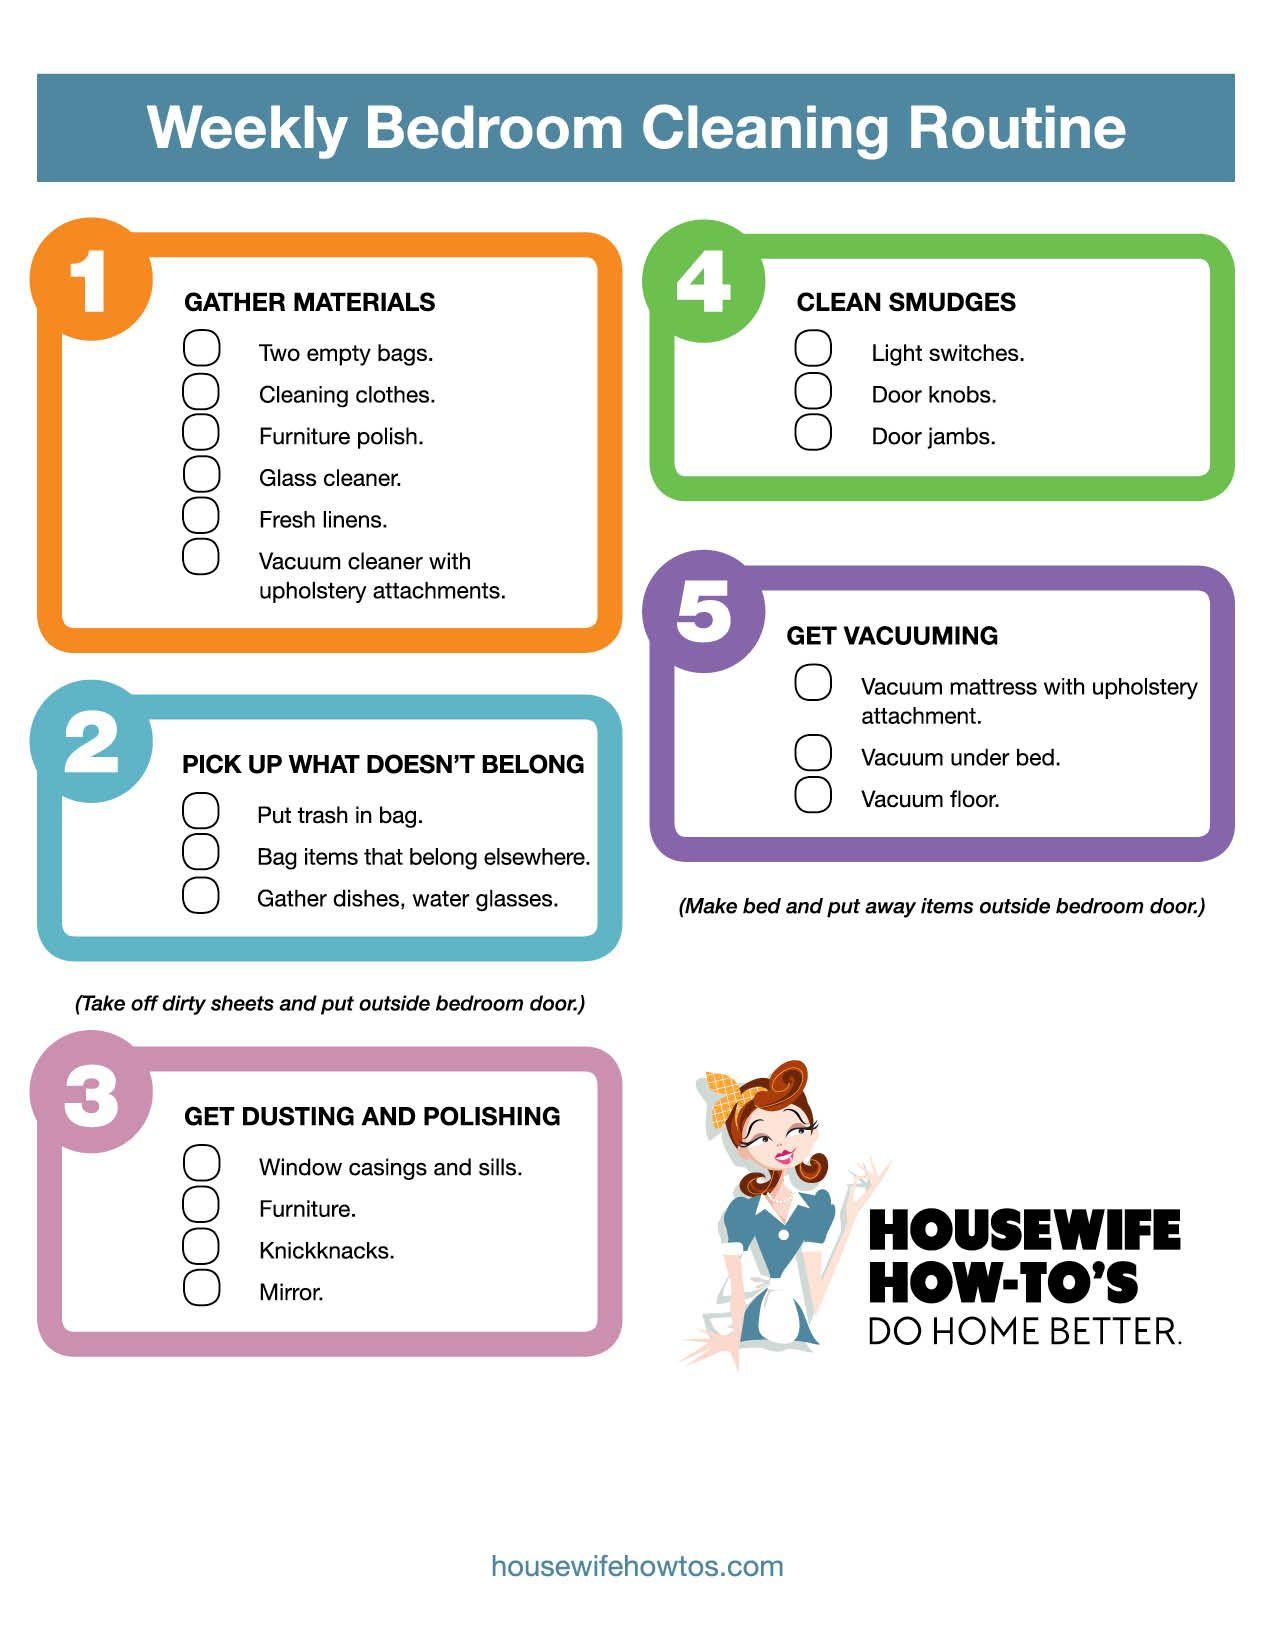 Weekly Bedroom Cleaning Checklist Printable